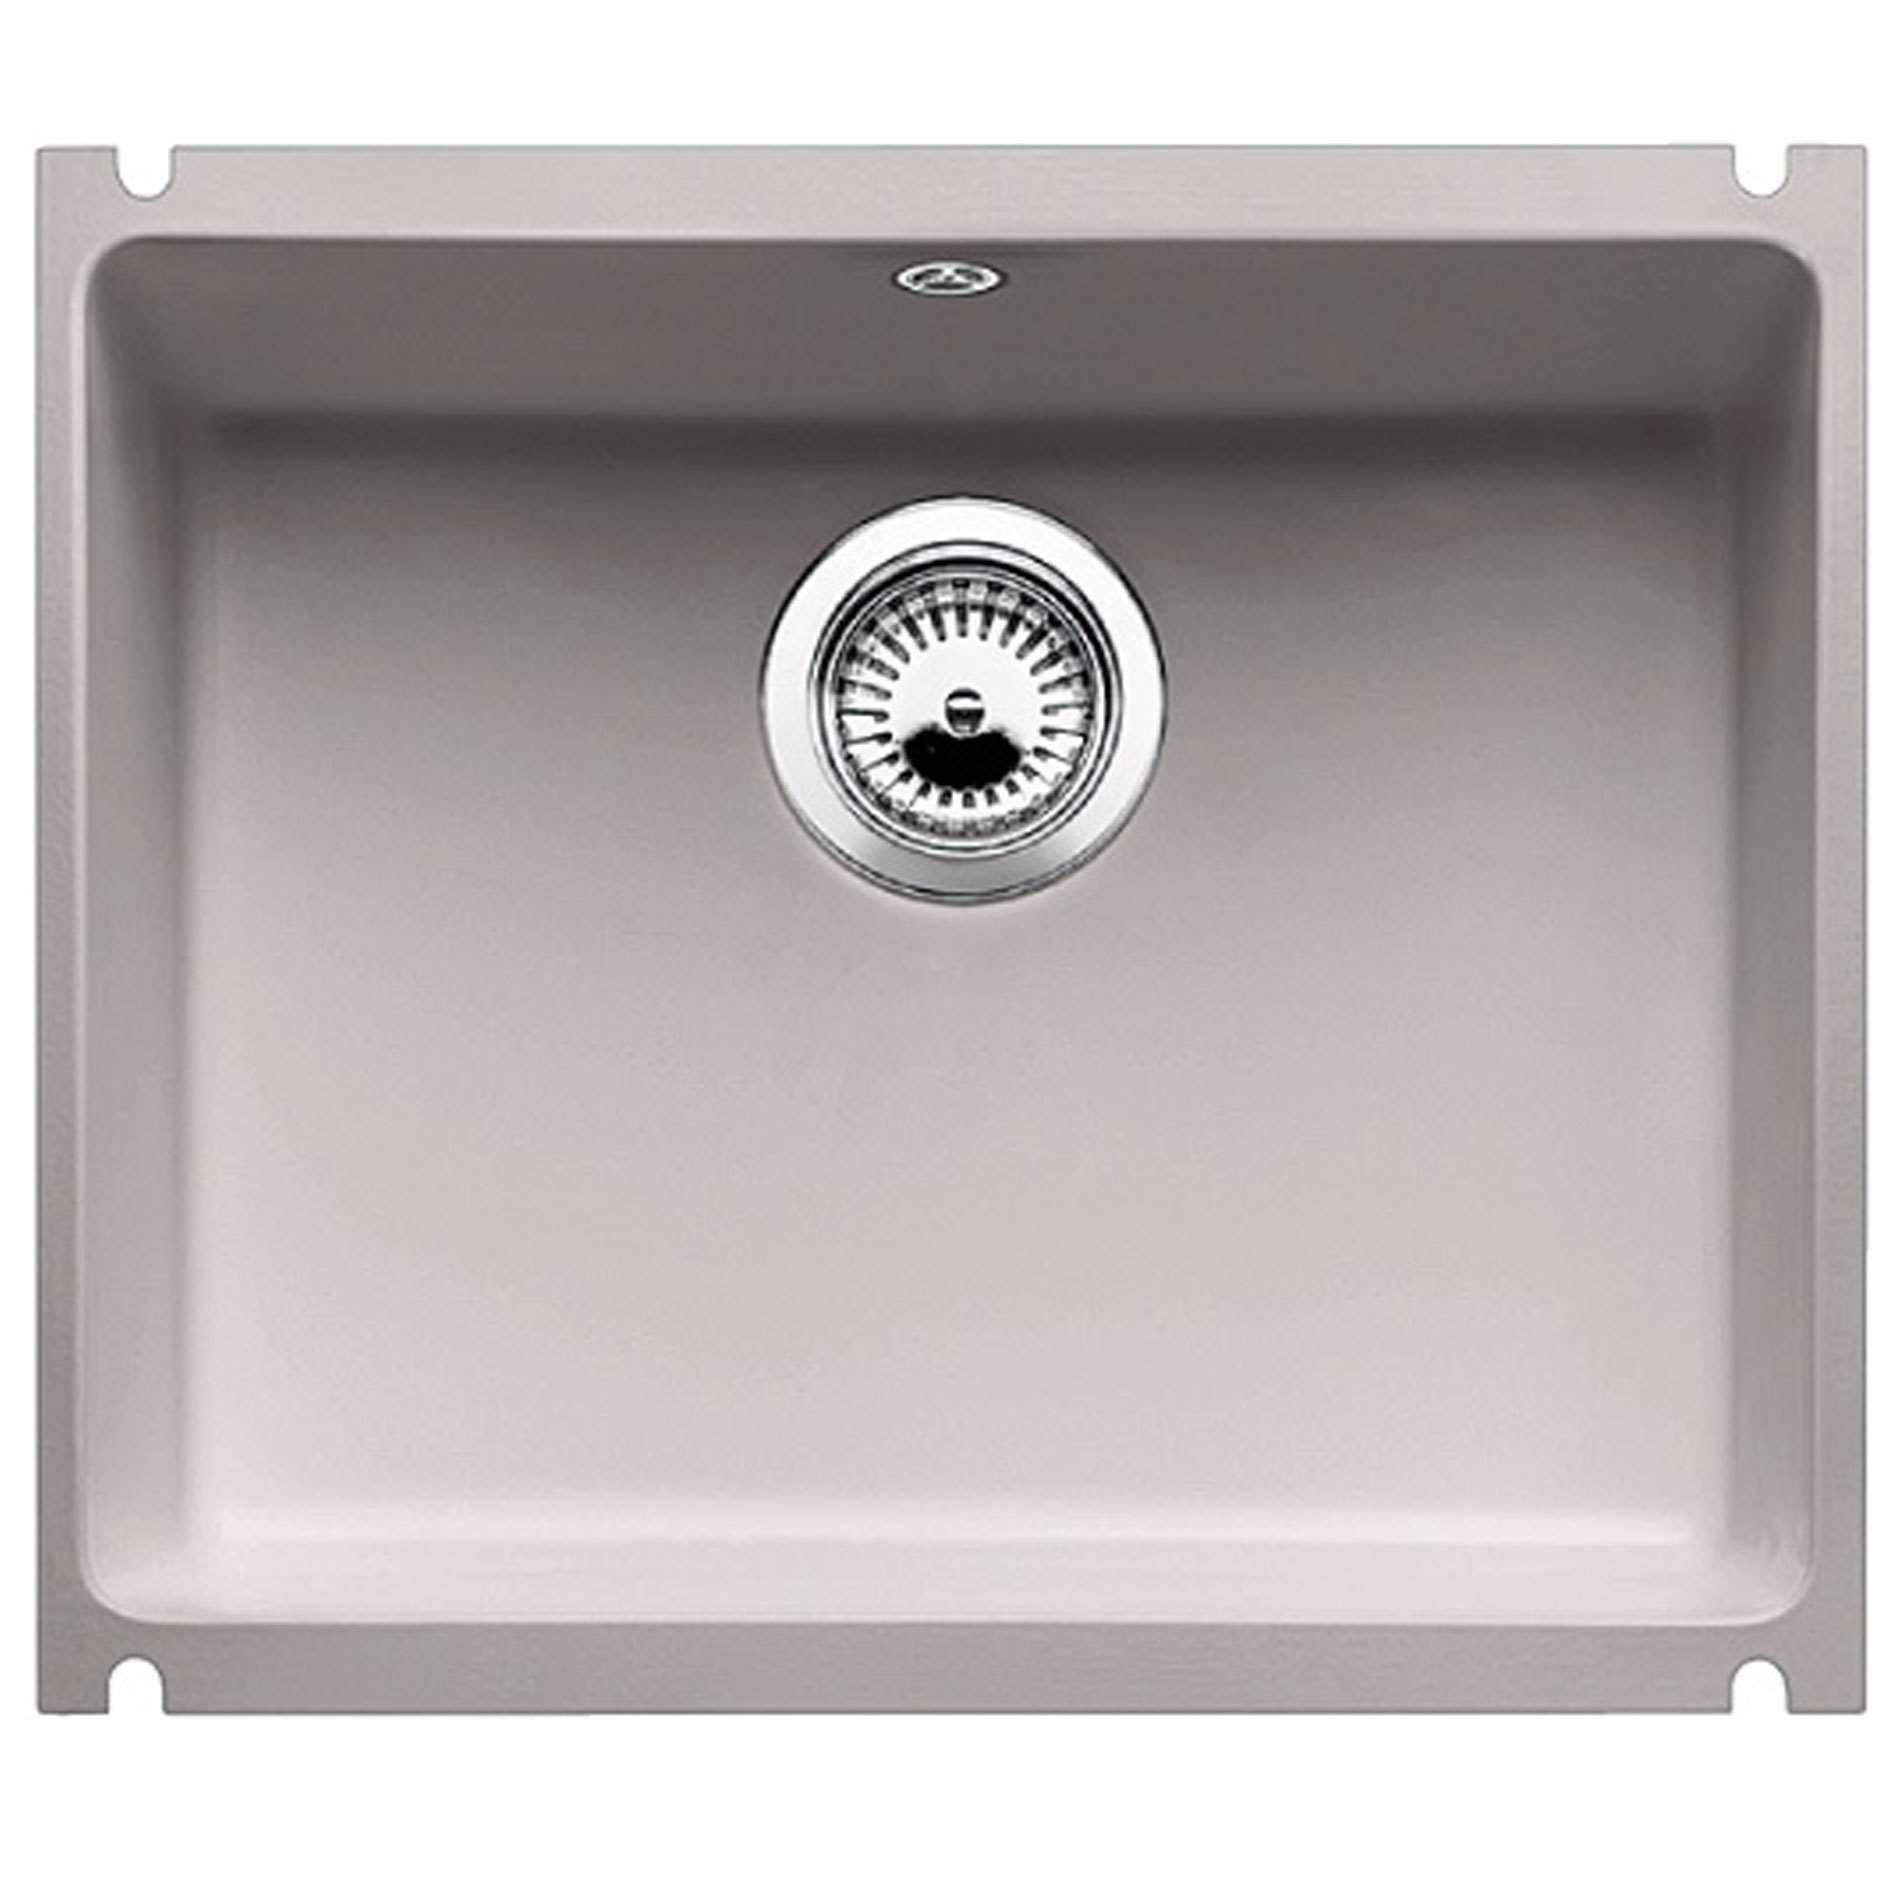 Blanco Und 8529 Subline 500 U Alugrey Ceramic Sink Amp Arti